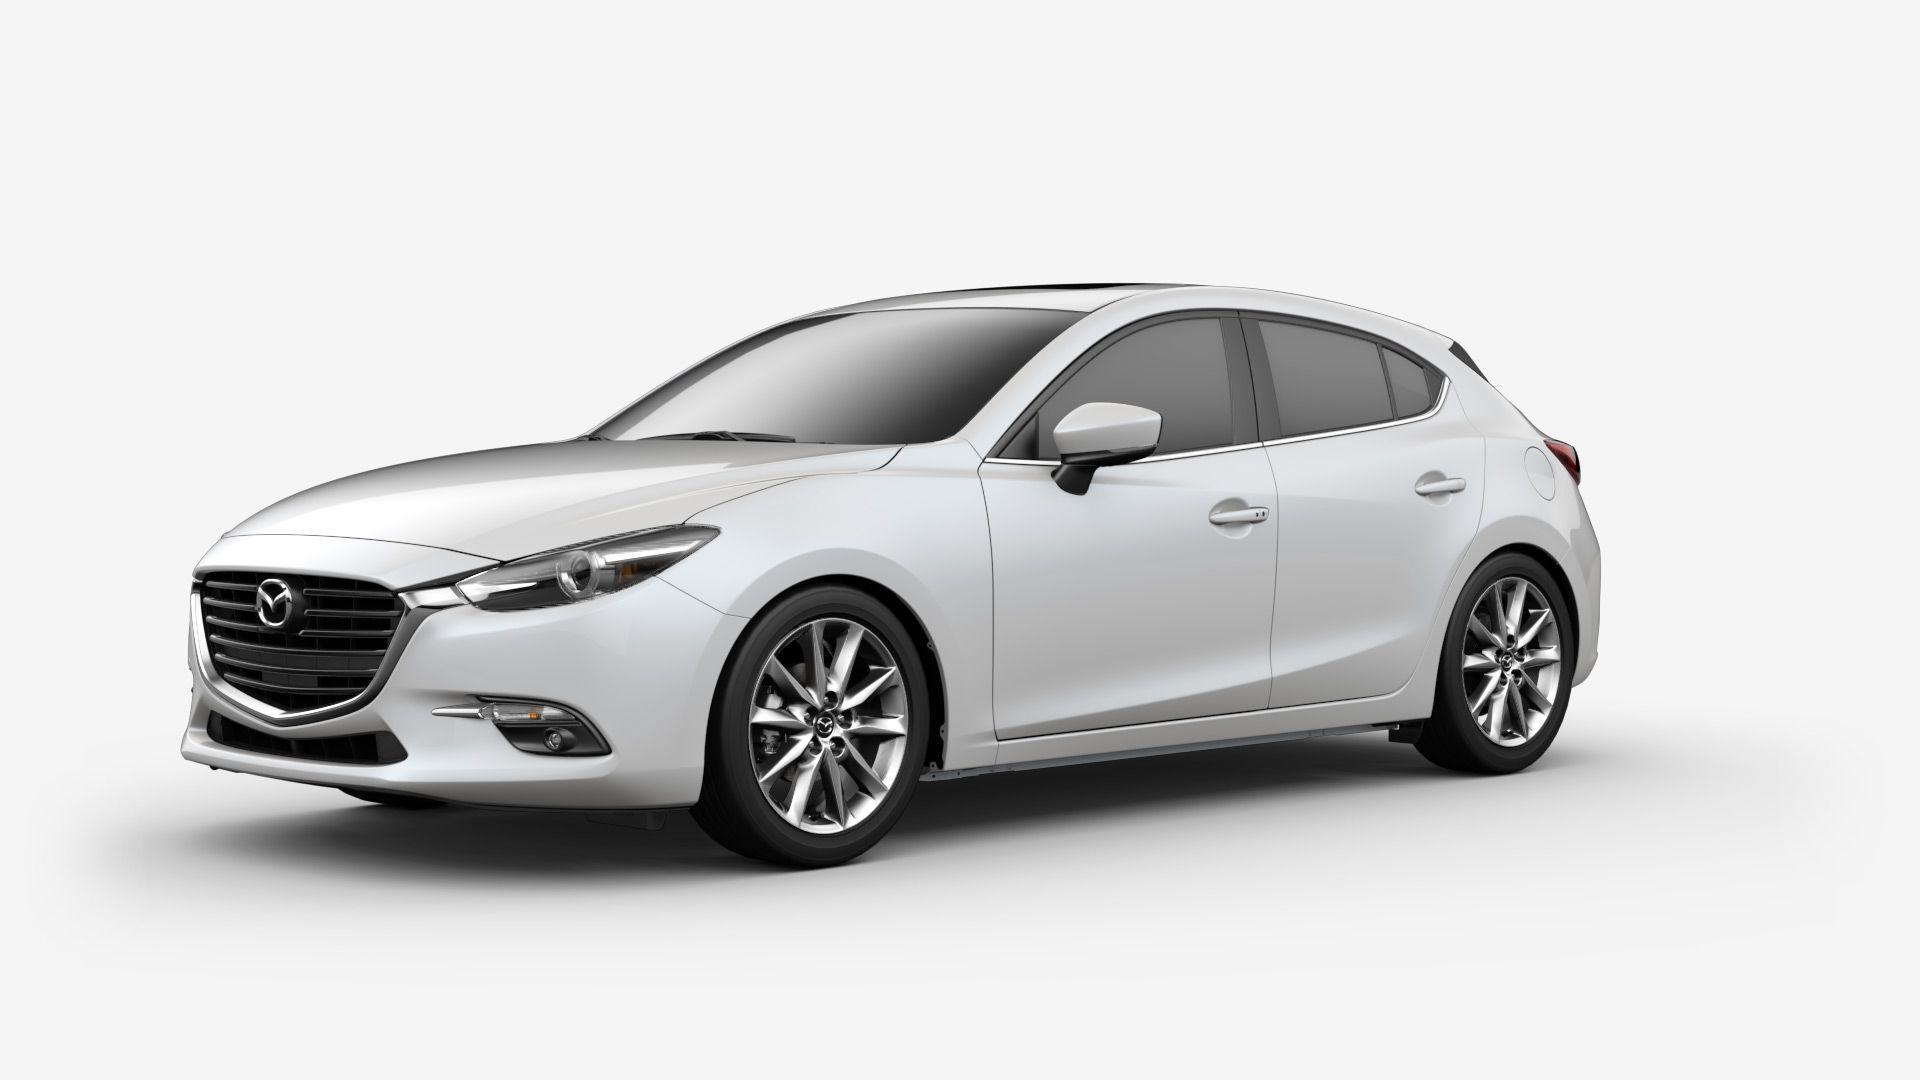 2018 Subaru Outback Price Mazda, Car wallpapers, Sports car